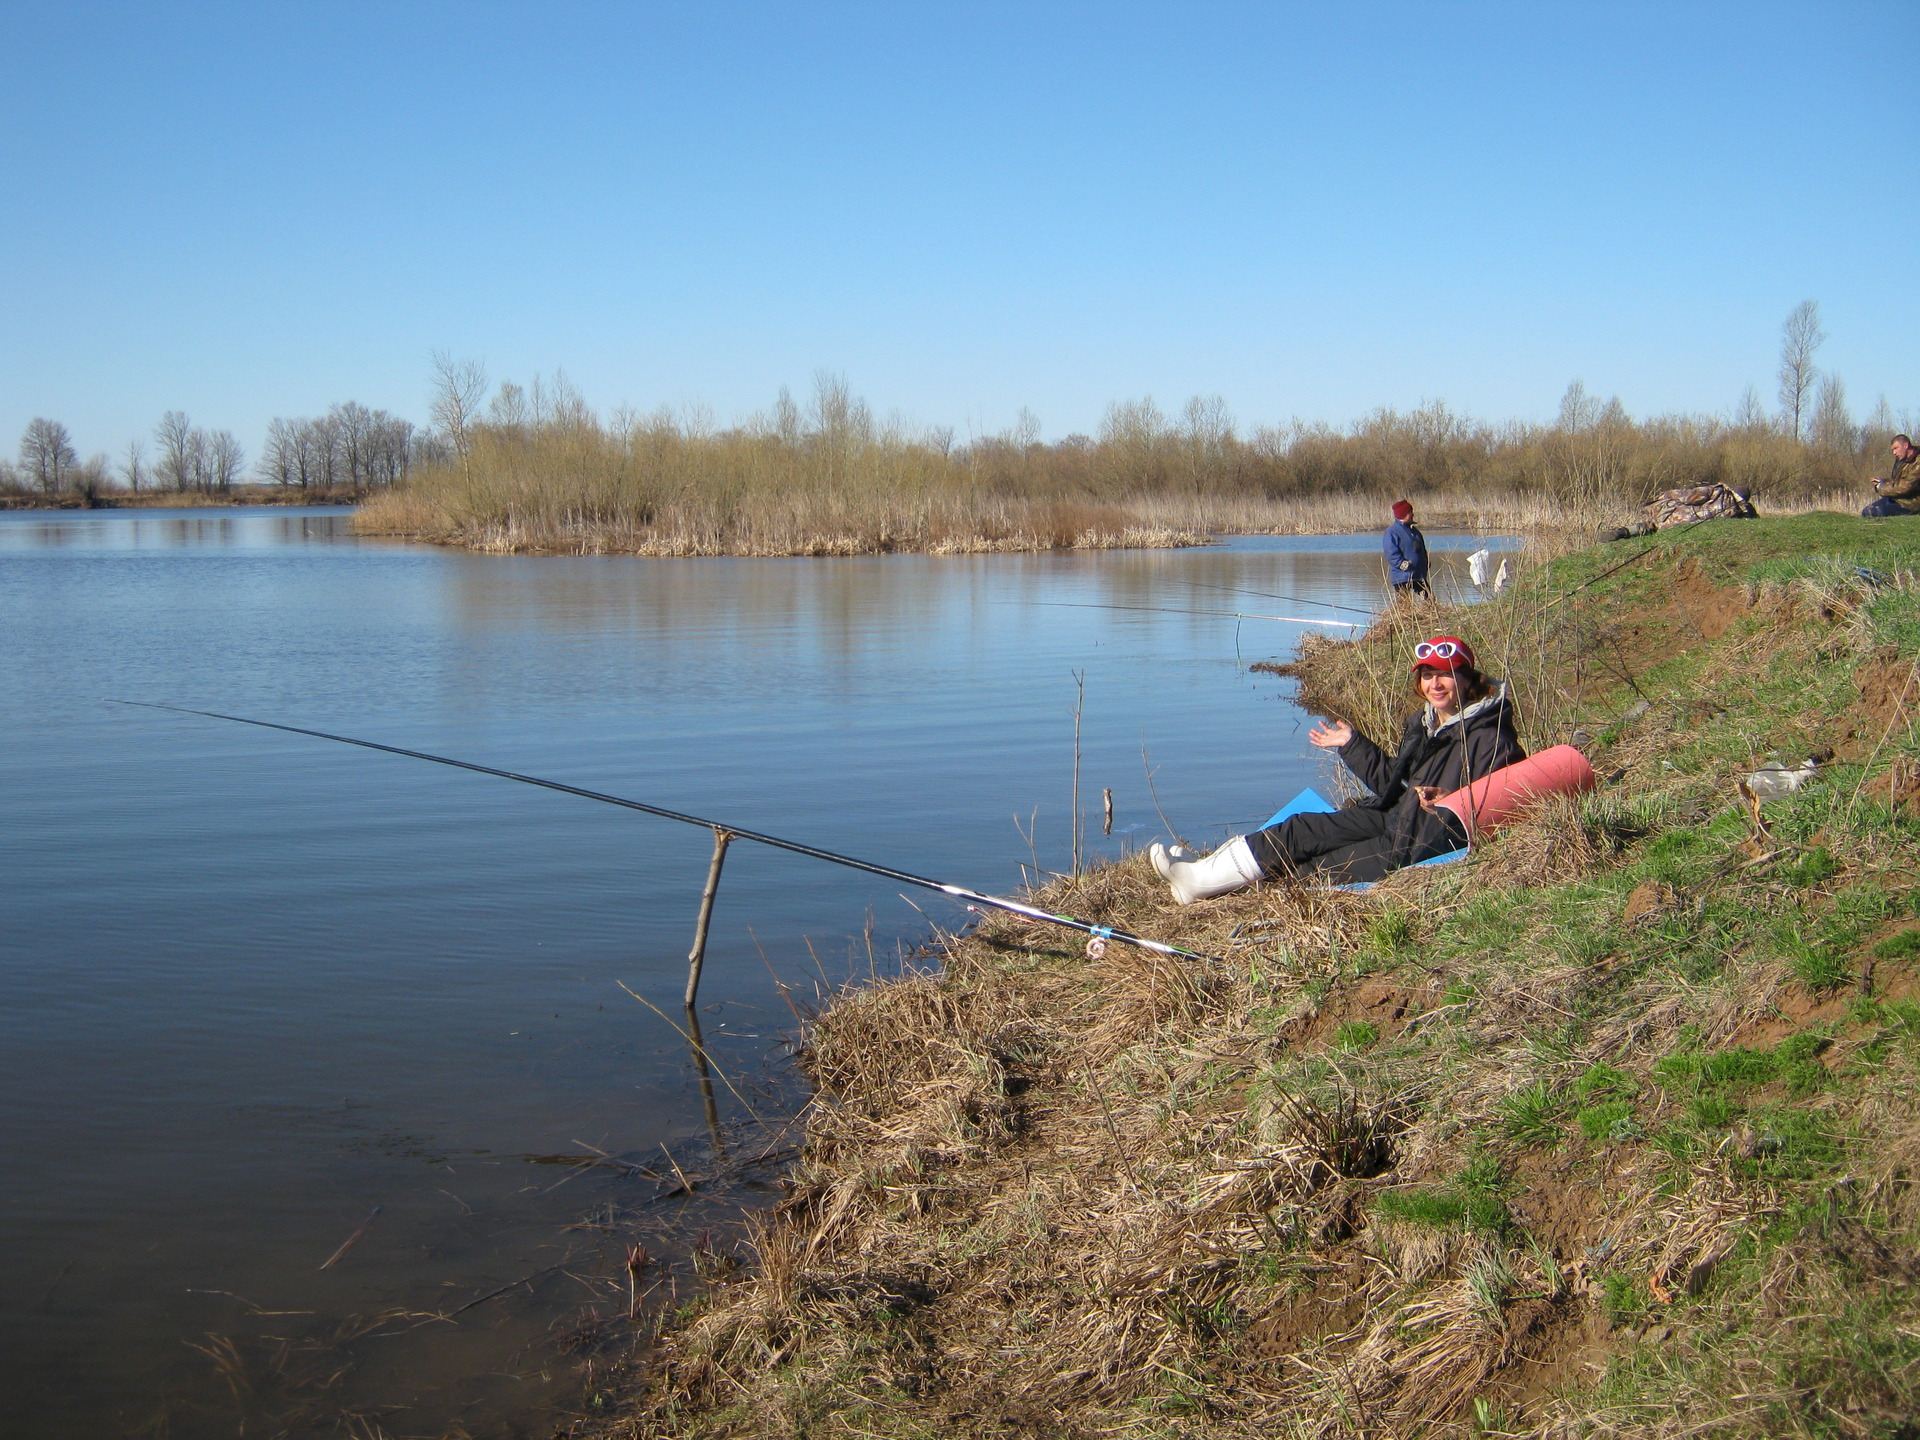 рыбалка в удмуртии цена